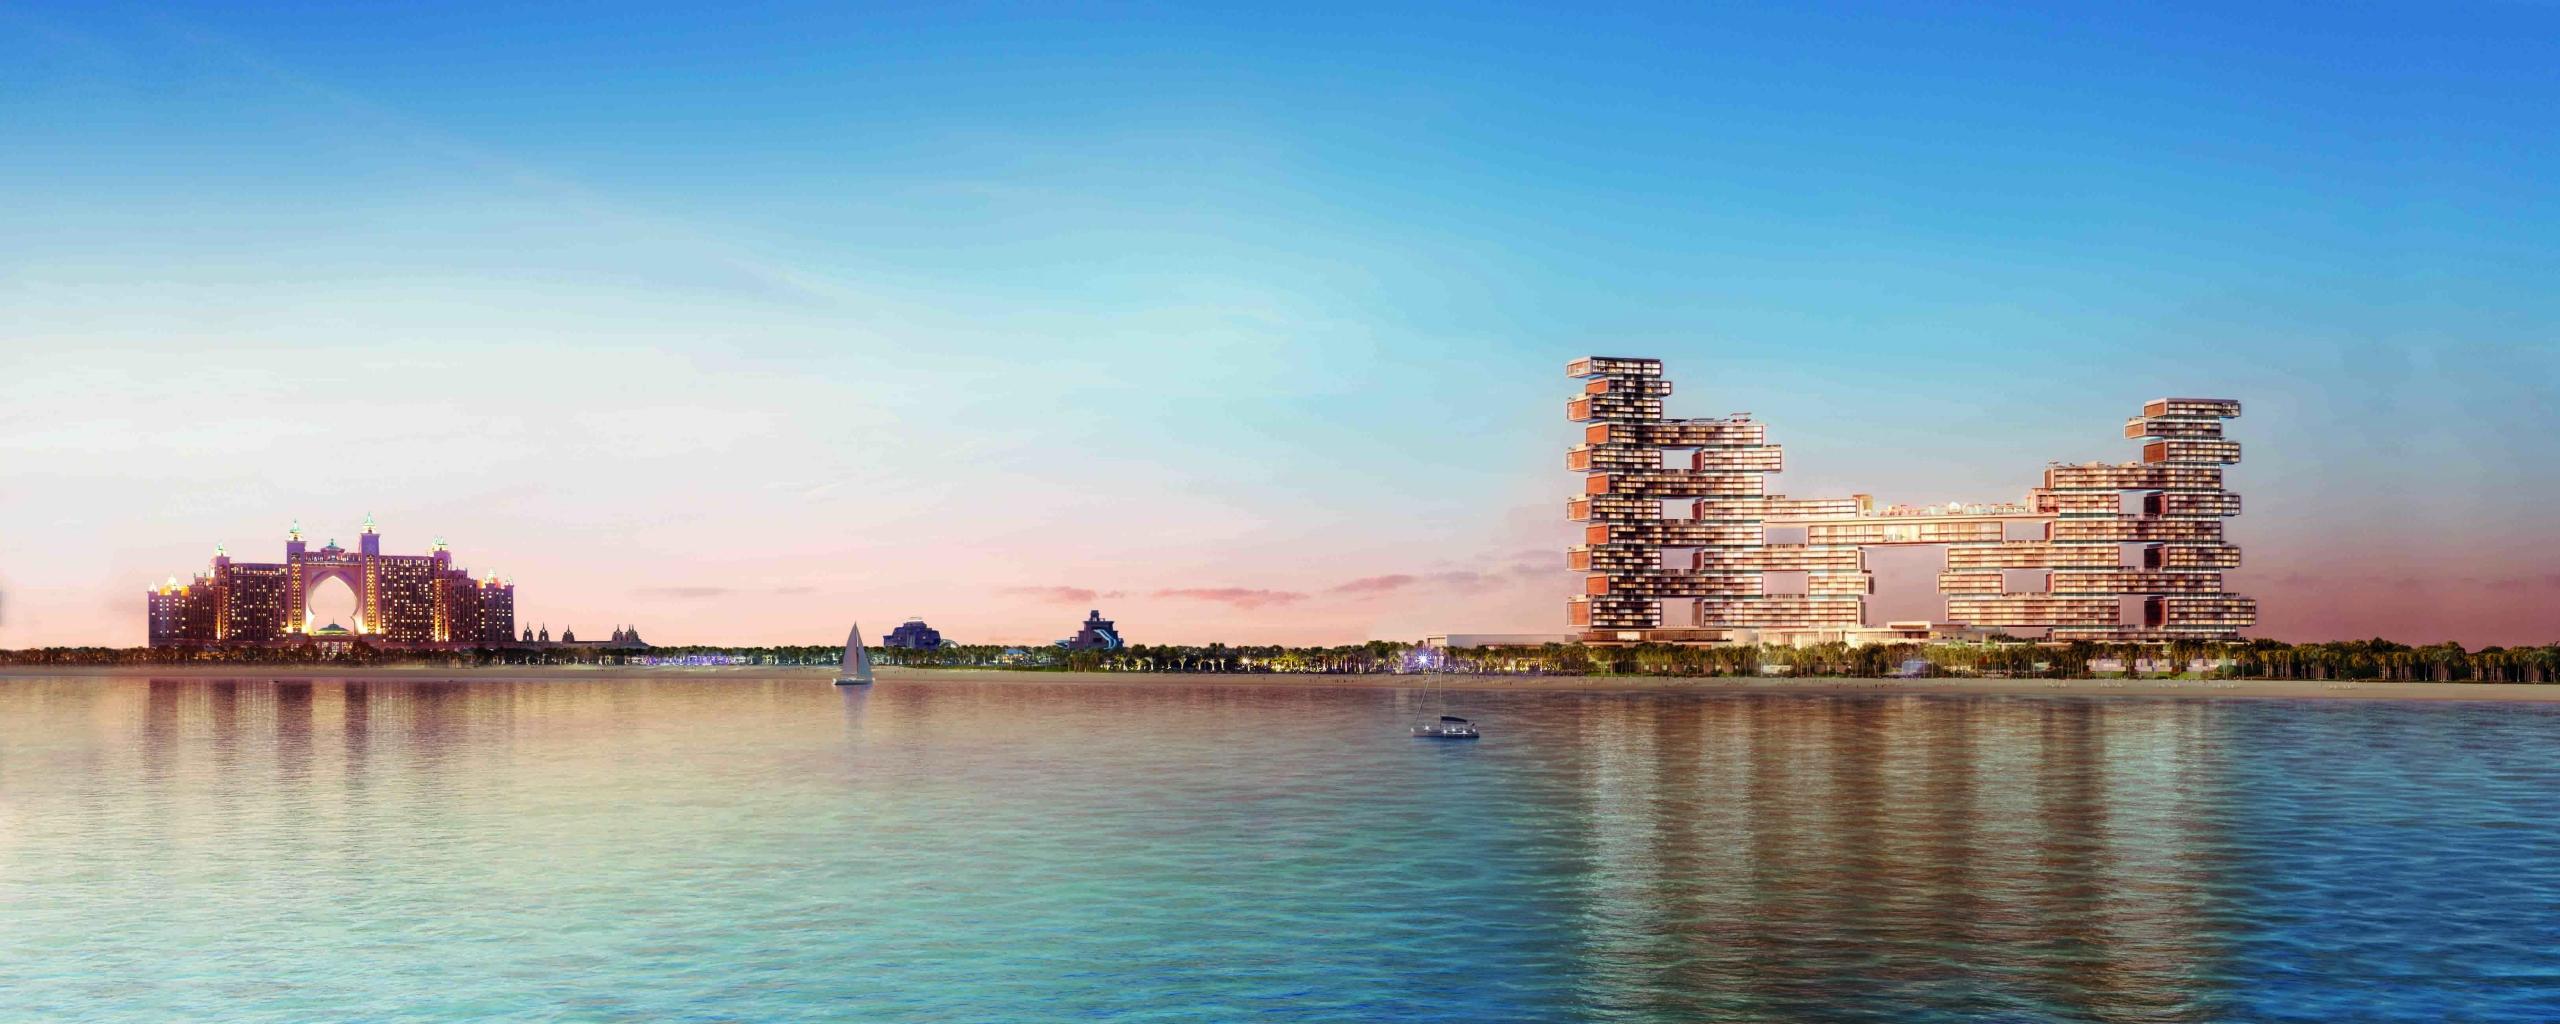 The Royal Atlantis Resort - Luxushotel Dubai